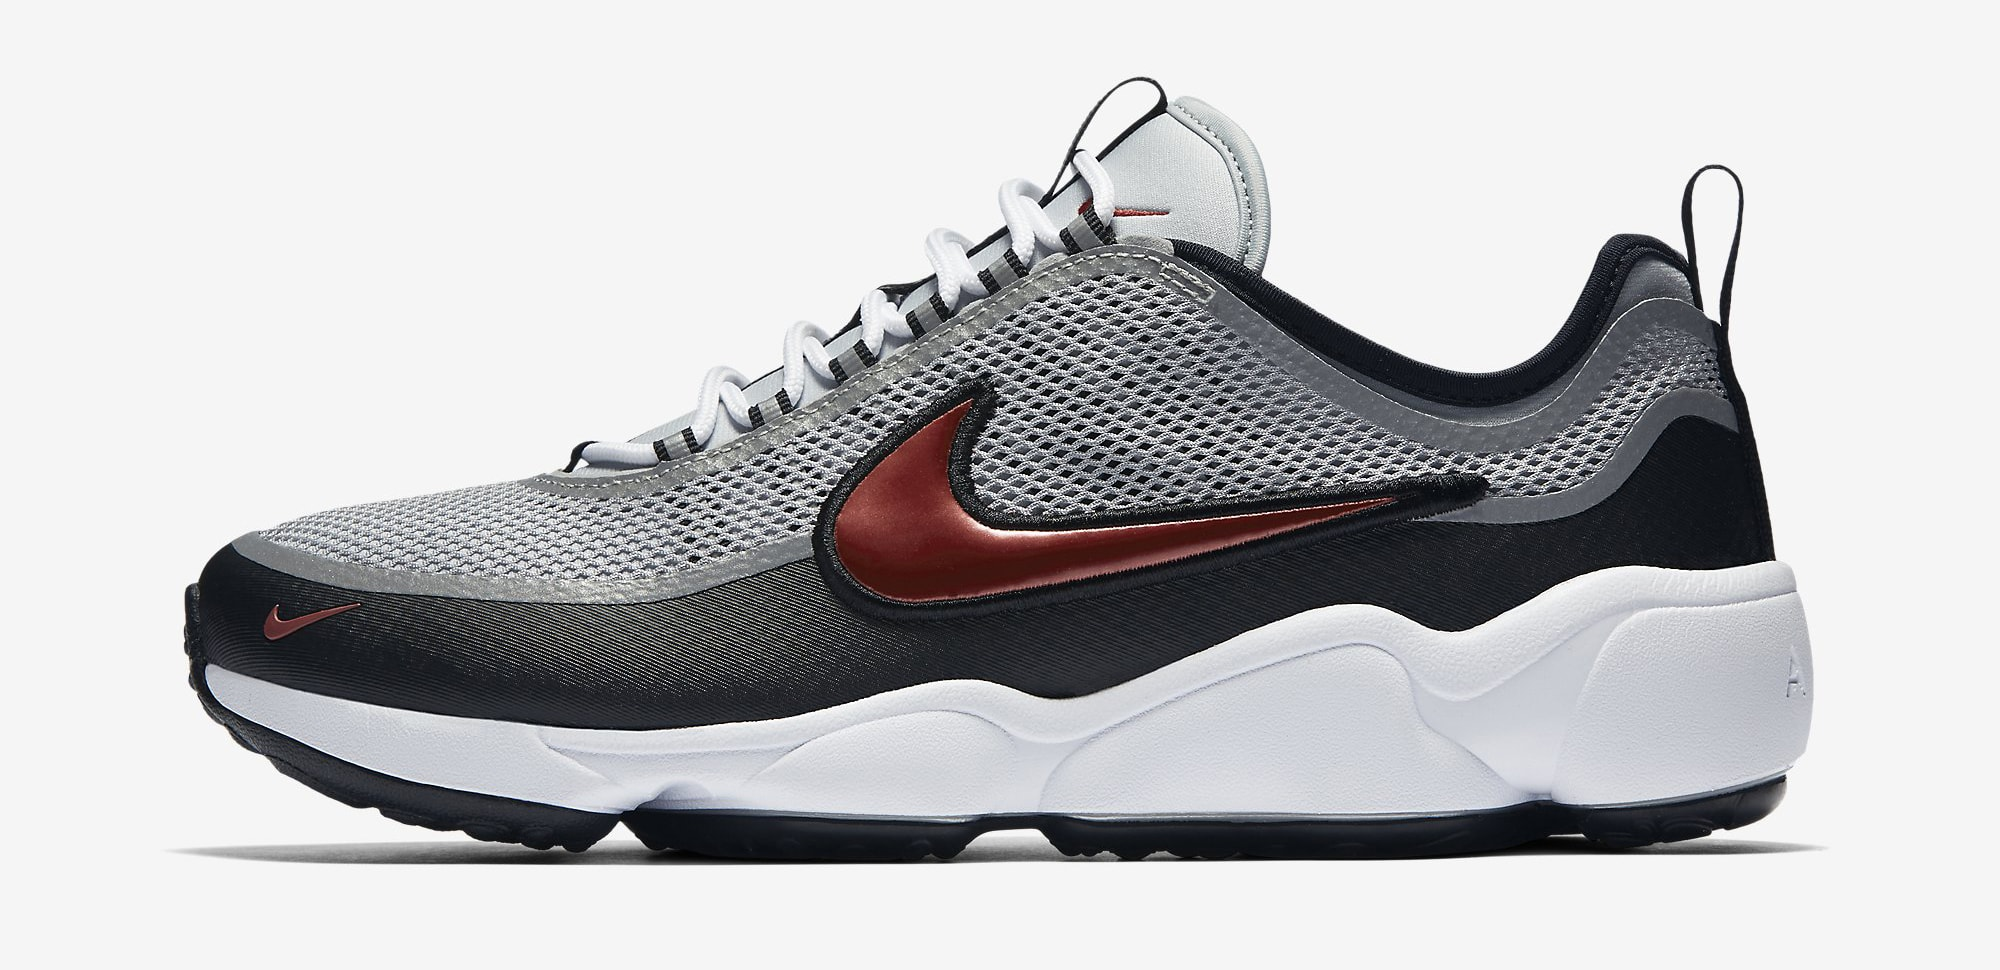 Nike Air Zoom Spiridon Ultra OG 876267-001 Profile